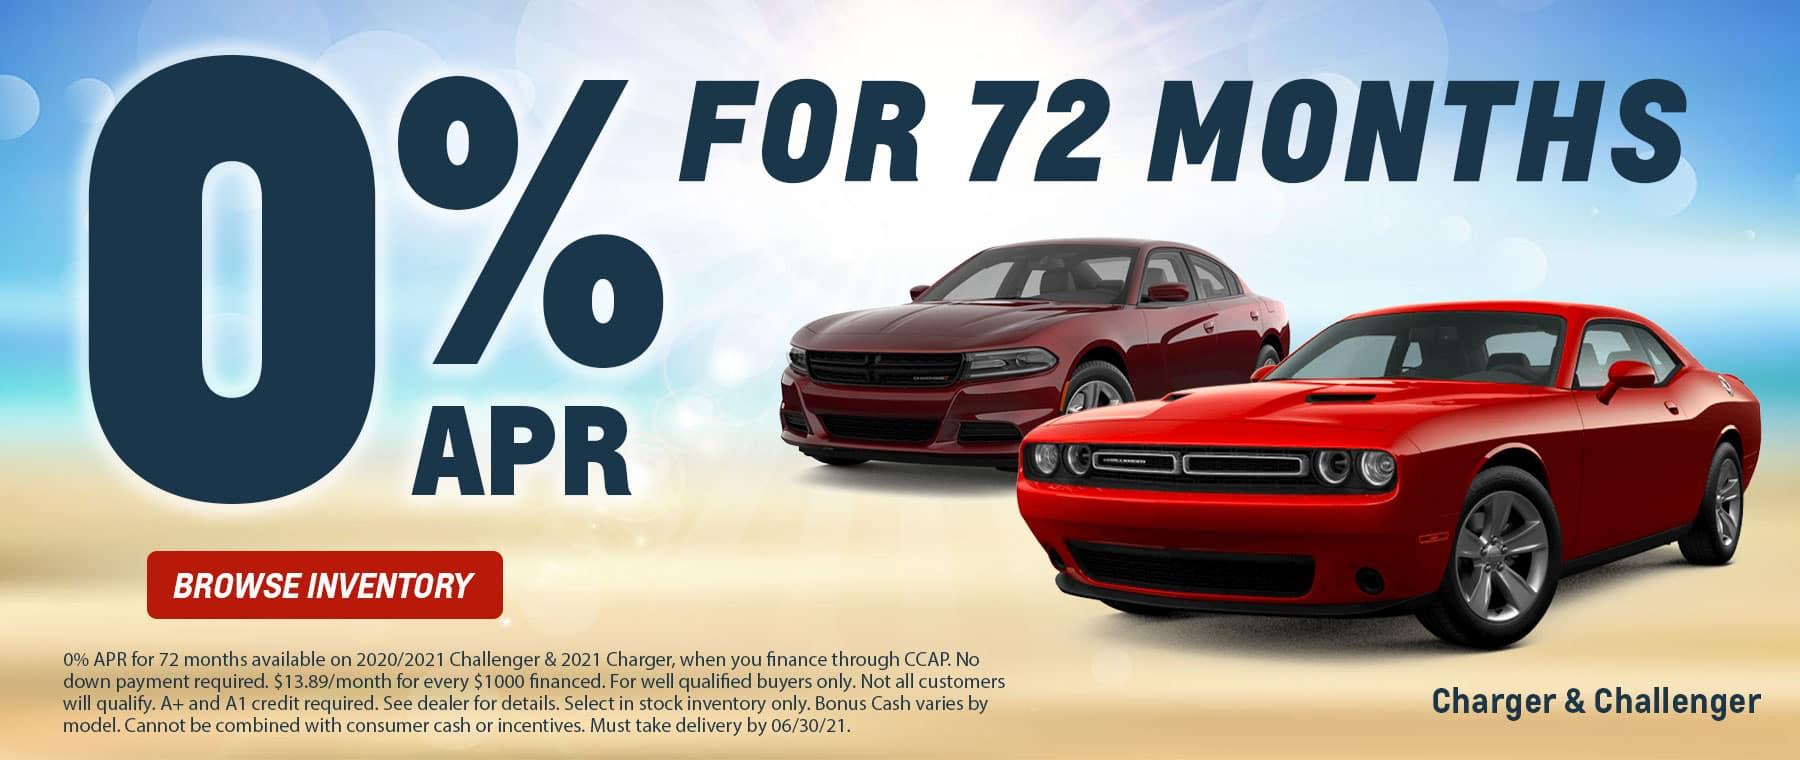 RH-Chrysler-Dodge-Jeep-Ram-Fiat-June21_TR-charger-1800×760